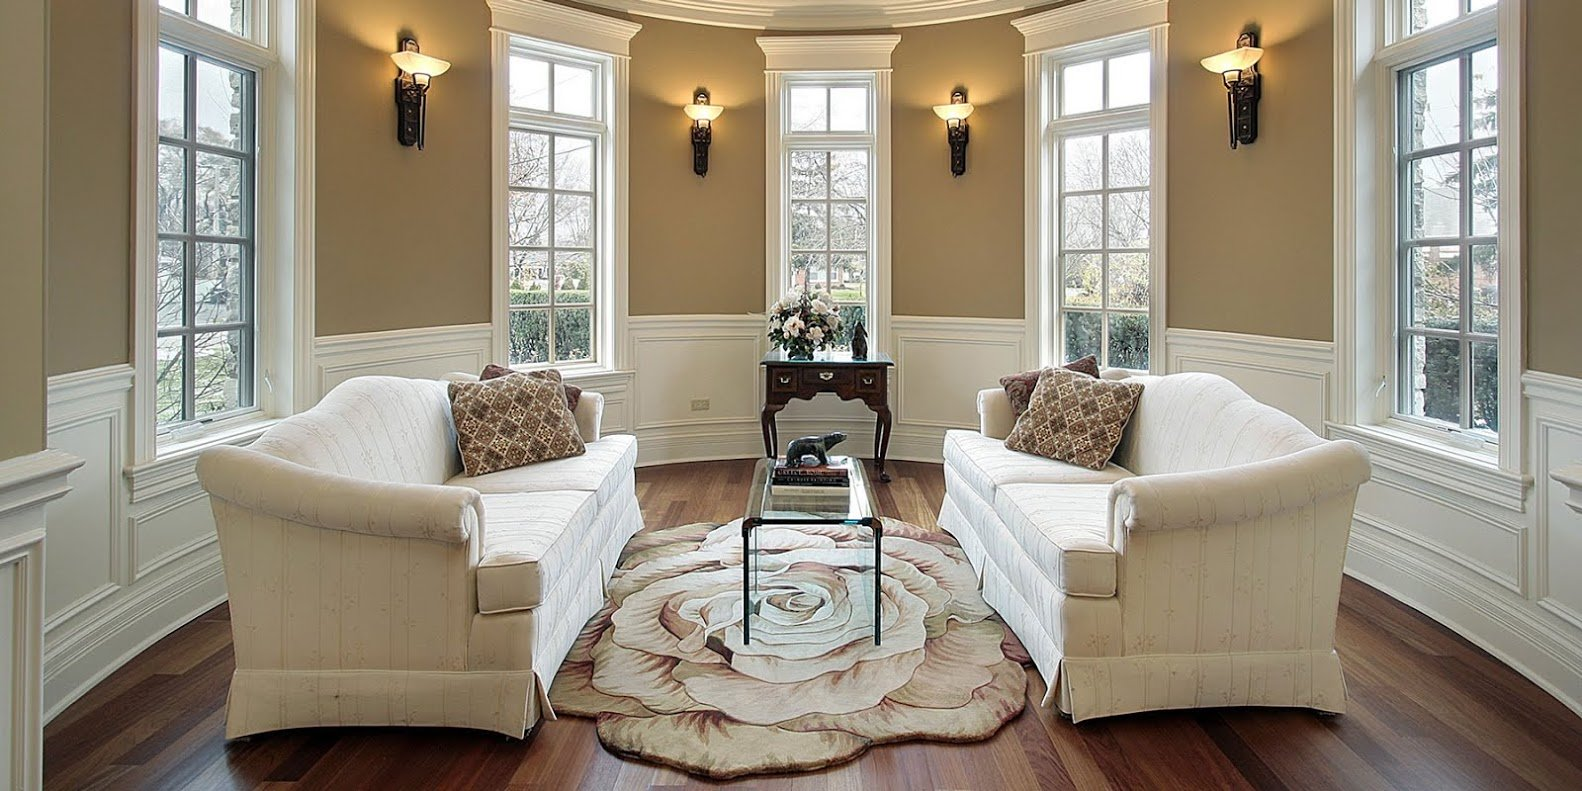 Real Estate Agent - Linda Peterson - CENTURY 21 Mike Bowman, Inc